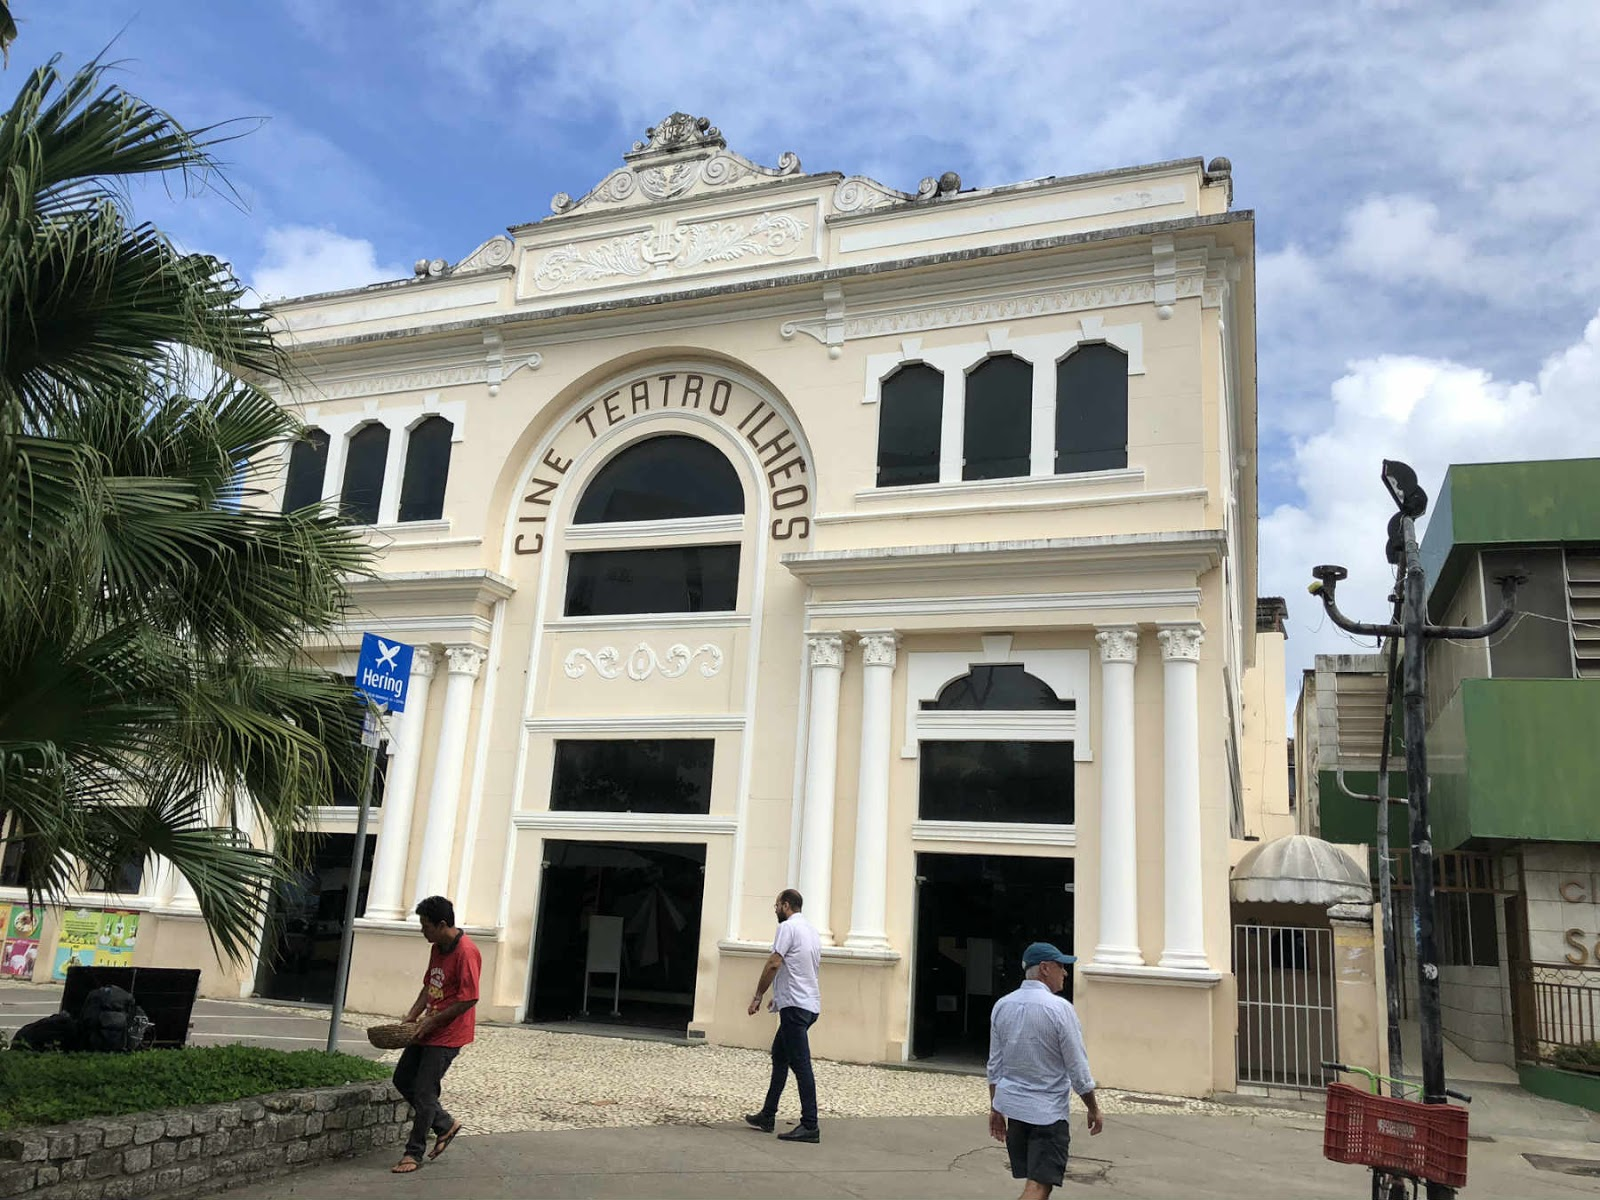 Teatro Municipal de Ilhéus